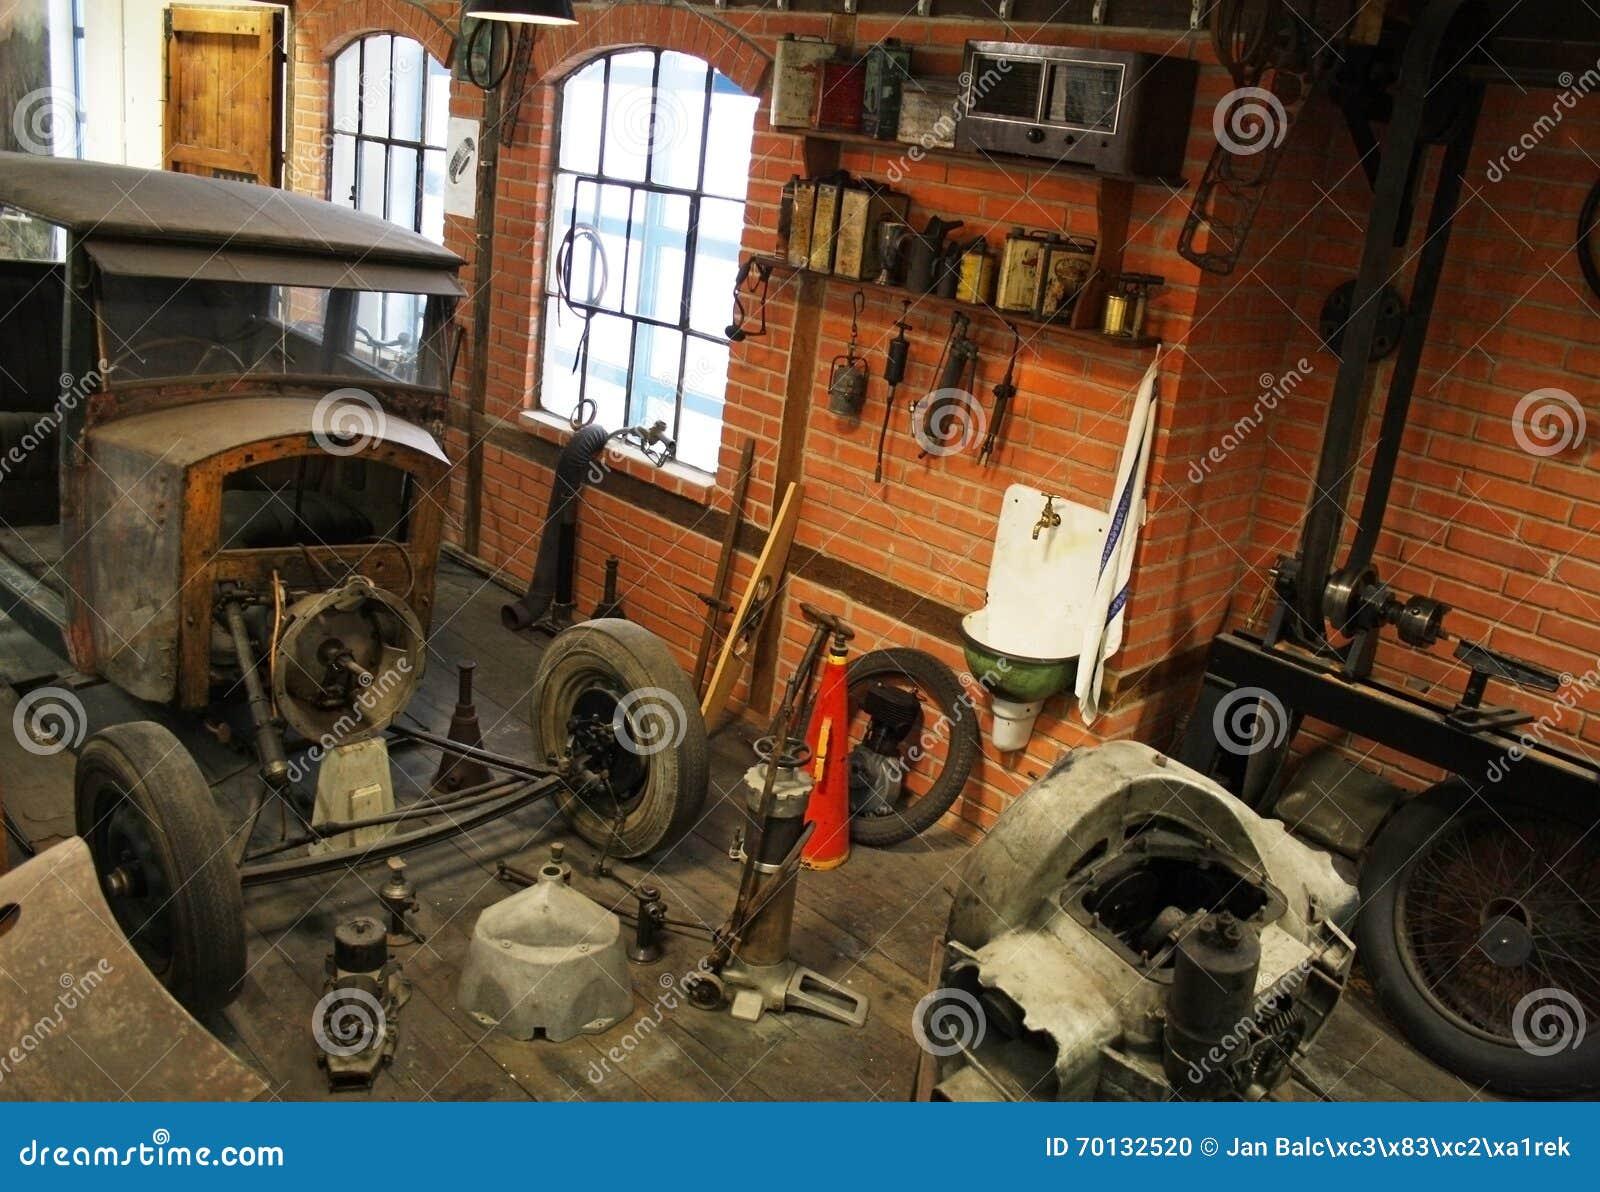 Vintage Garage Inside Stock Photo Image Of Veteran Broken 70132520